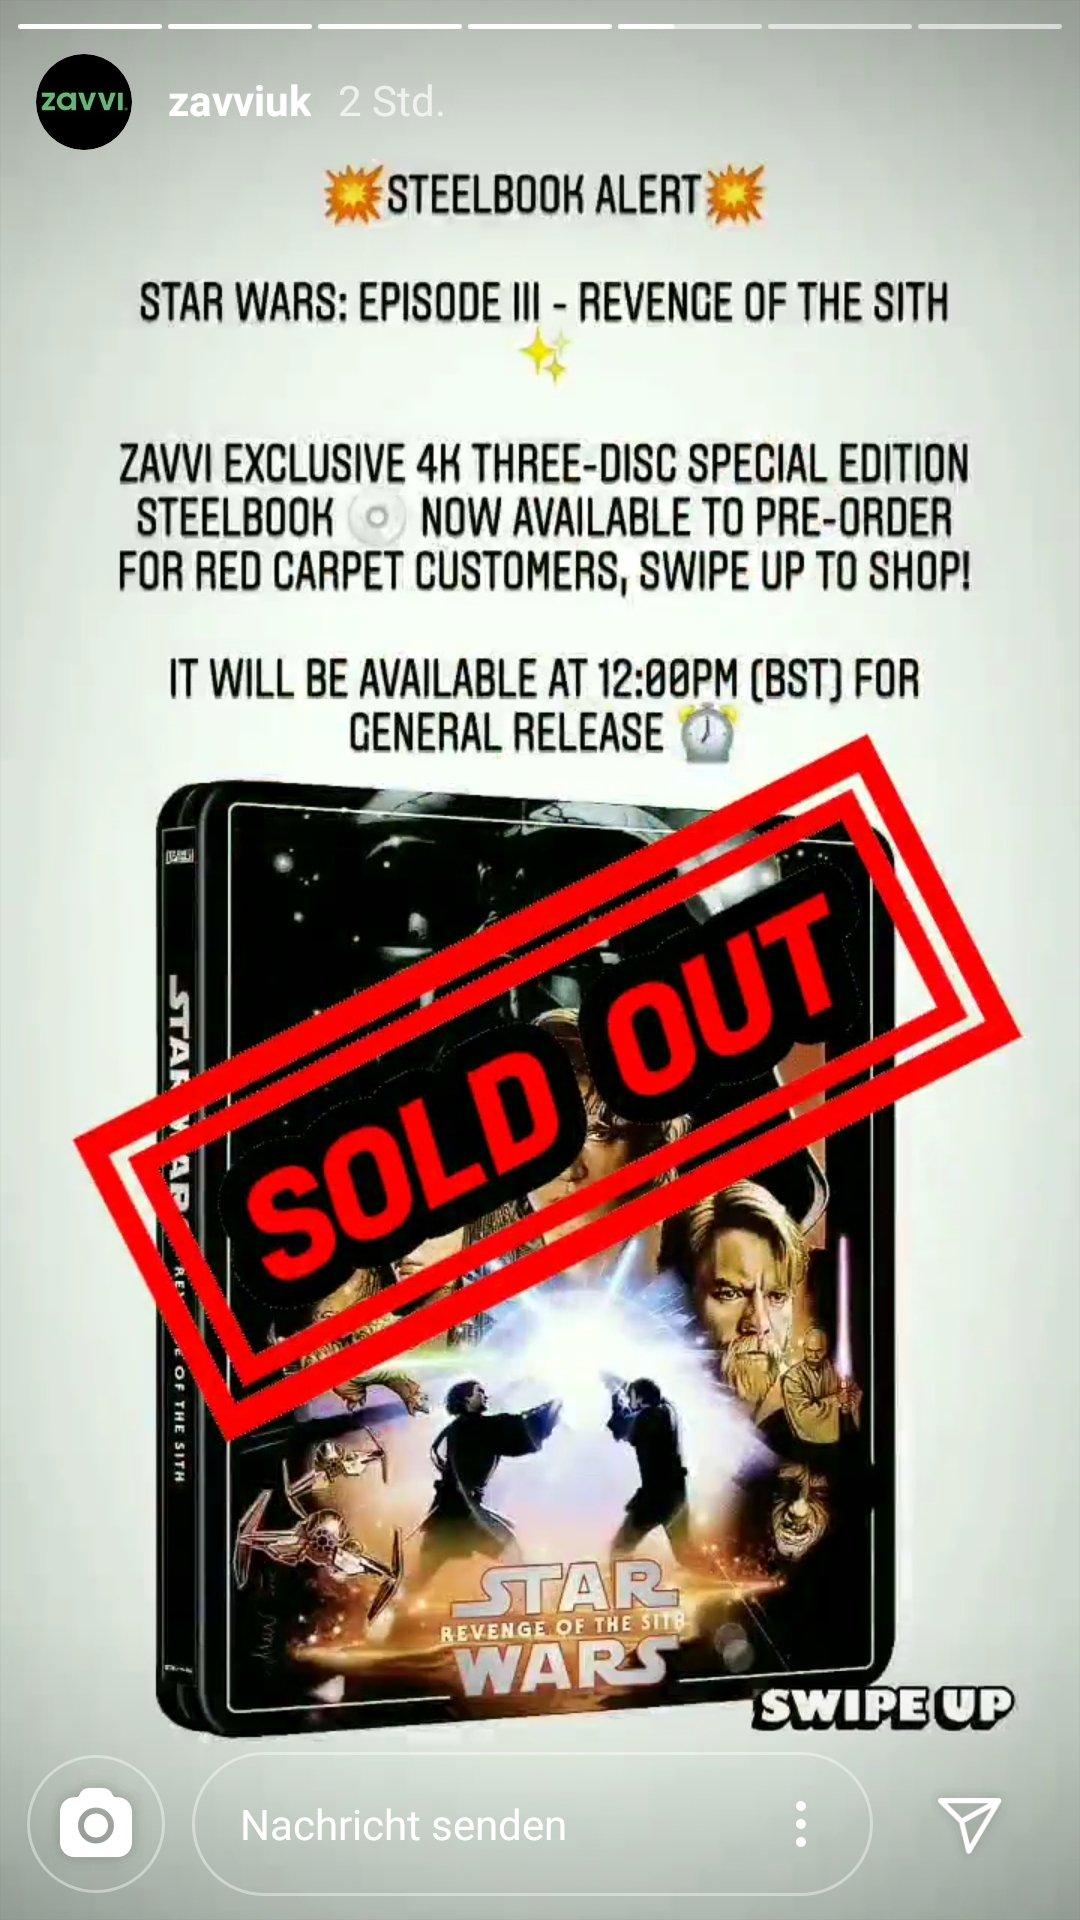 Zavvi Star Wars Episode Iii Revenge Of The Sith 4k Uhd 2d Blu Ray Steelbook Zavvi Exclusive Uk Zavvi Media Psychos